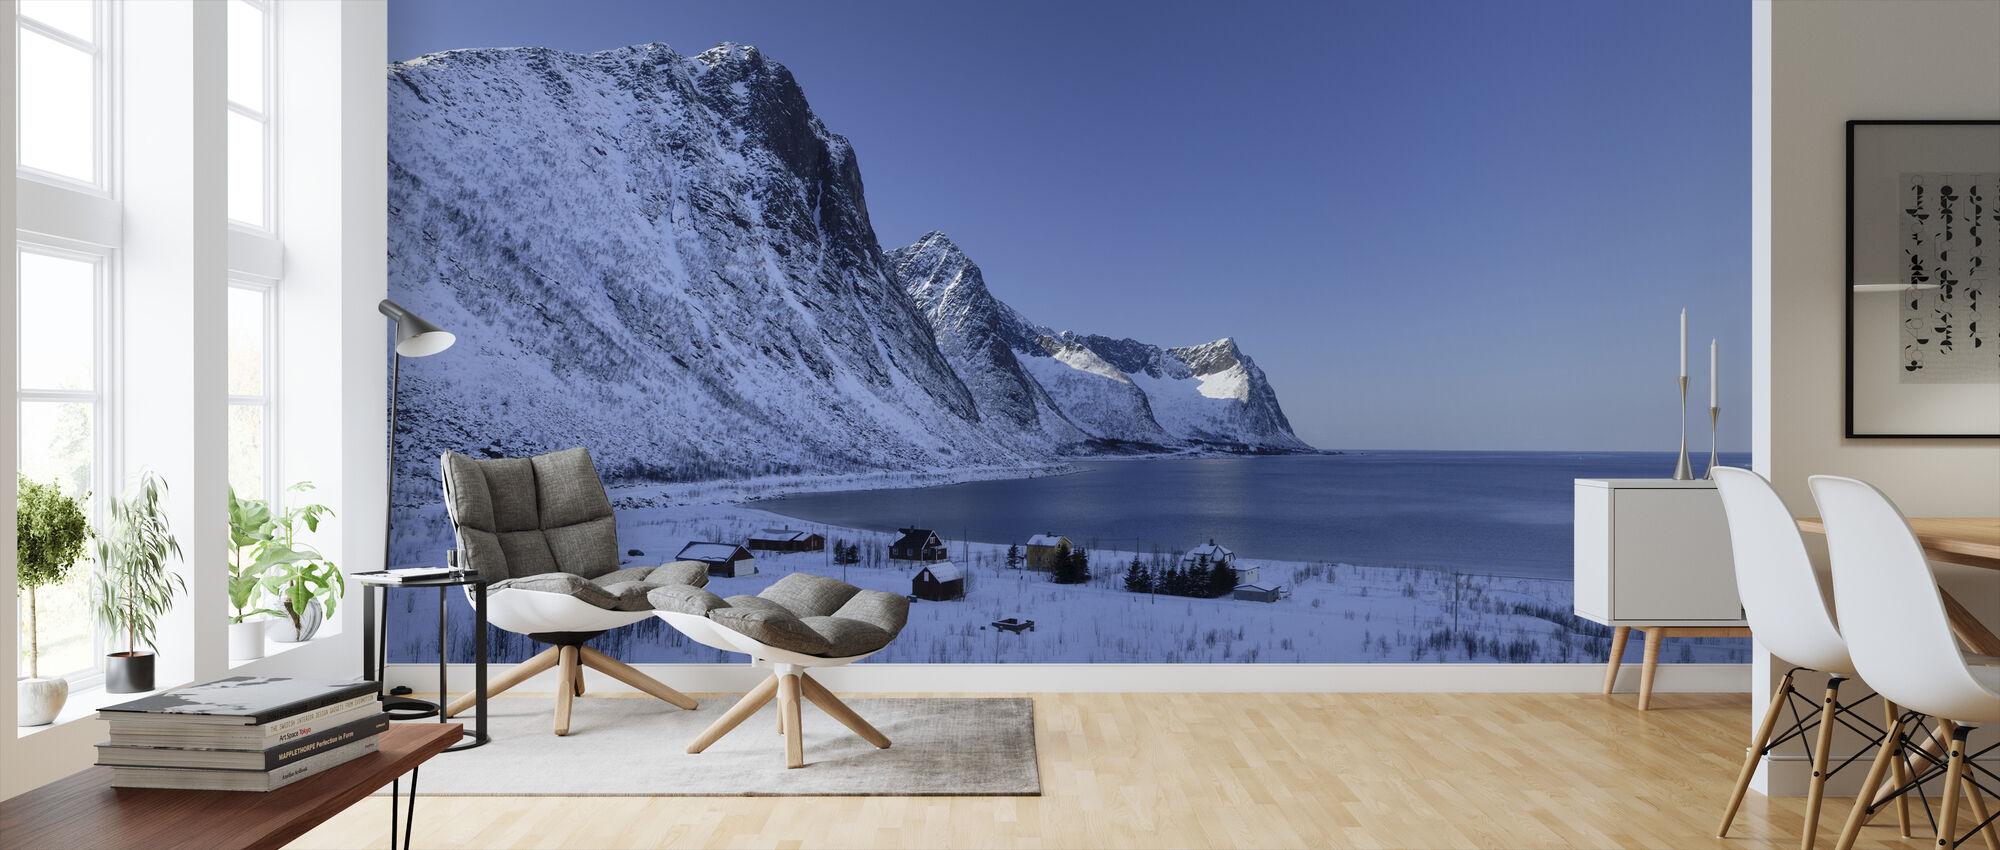 Fishing Village in Senja, Norway - Wallpaper - Living Room